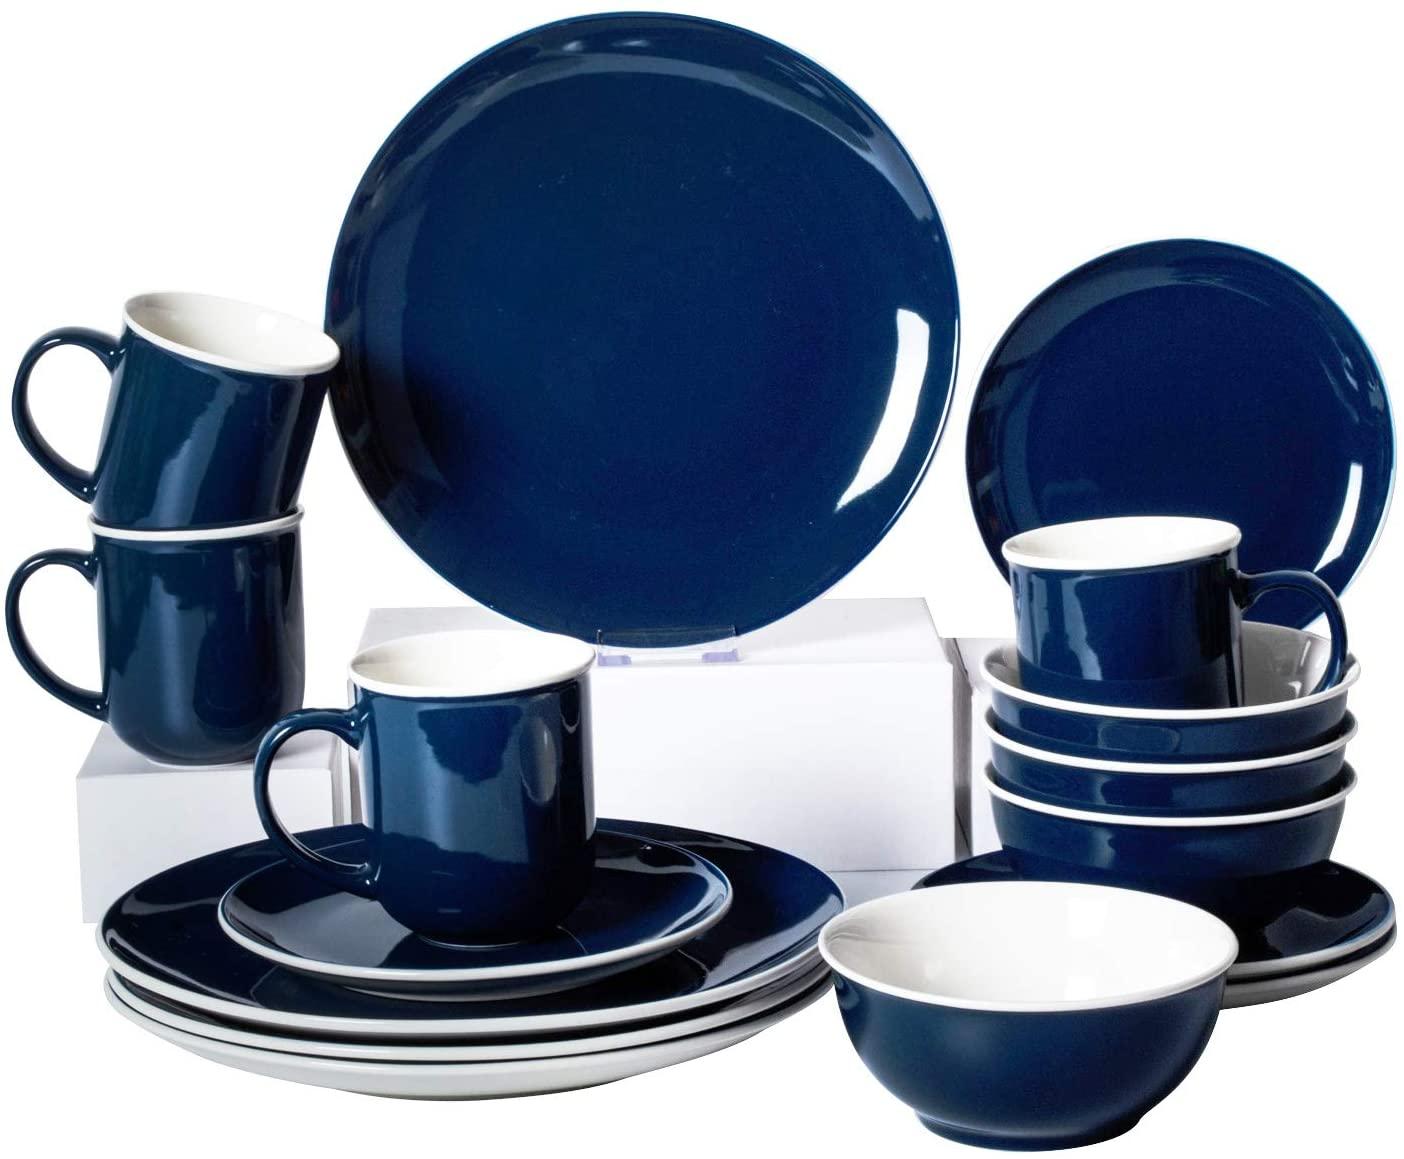 Xiteliy Ceramic Dinner Plate Sets, Plates, Bowls, Mugs, 4 Piece,Service For 4 (16, Blue)